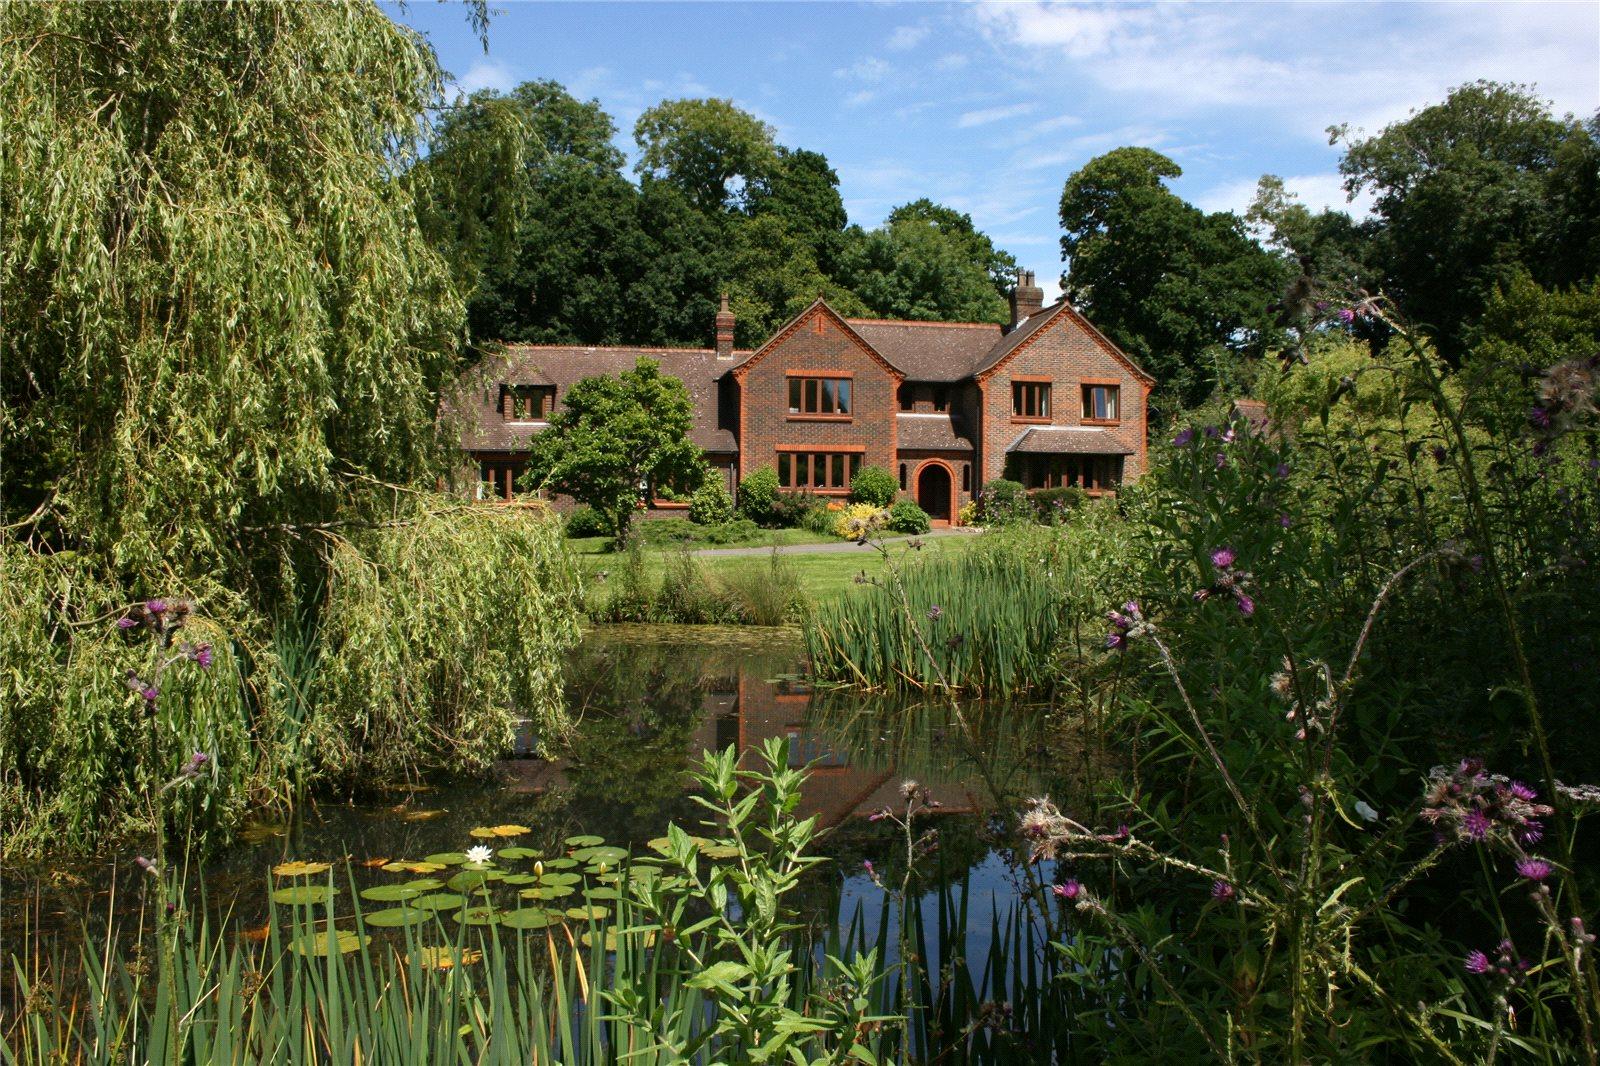 Vivienda unifamiliar por un Venta en Pine Grove, West Broyle, Chichester, West Sussex, PO19 Chichester, Inglaterra